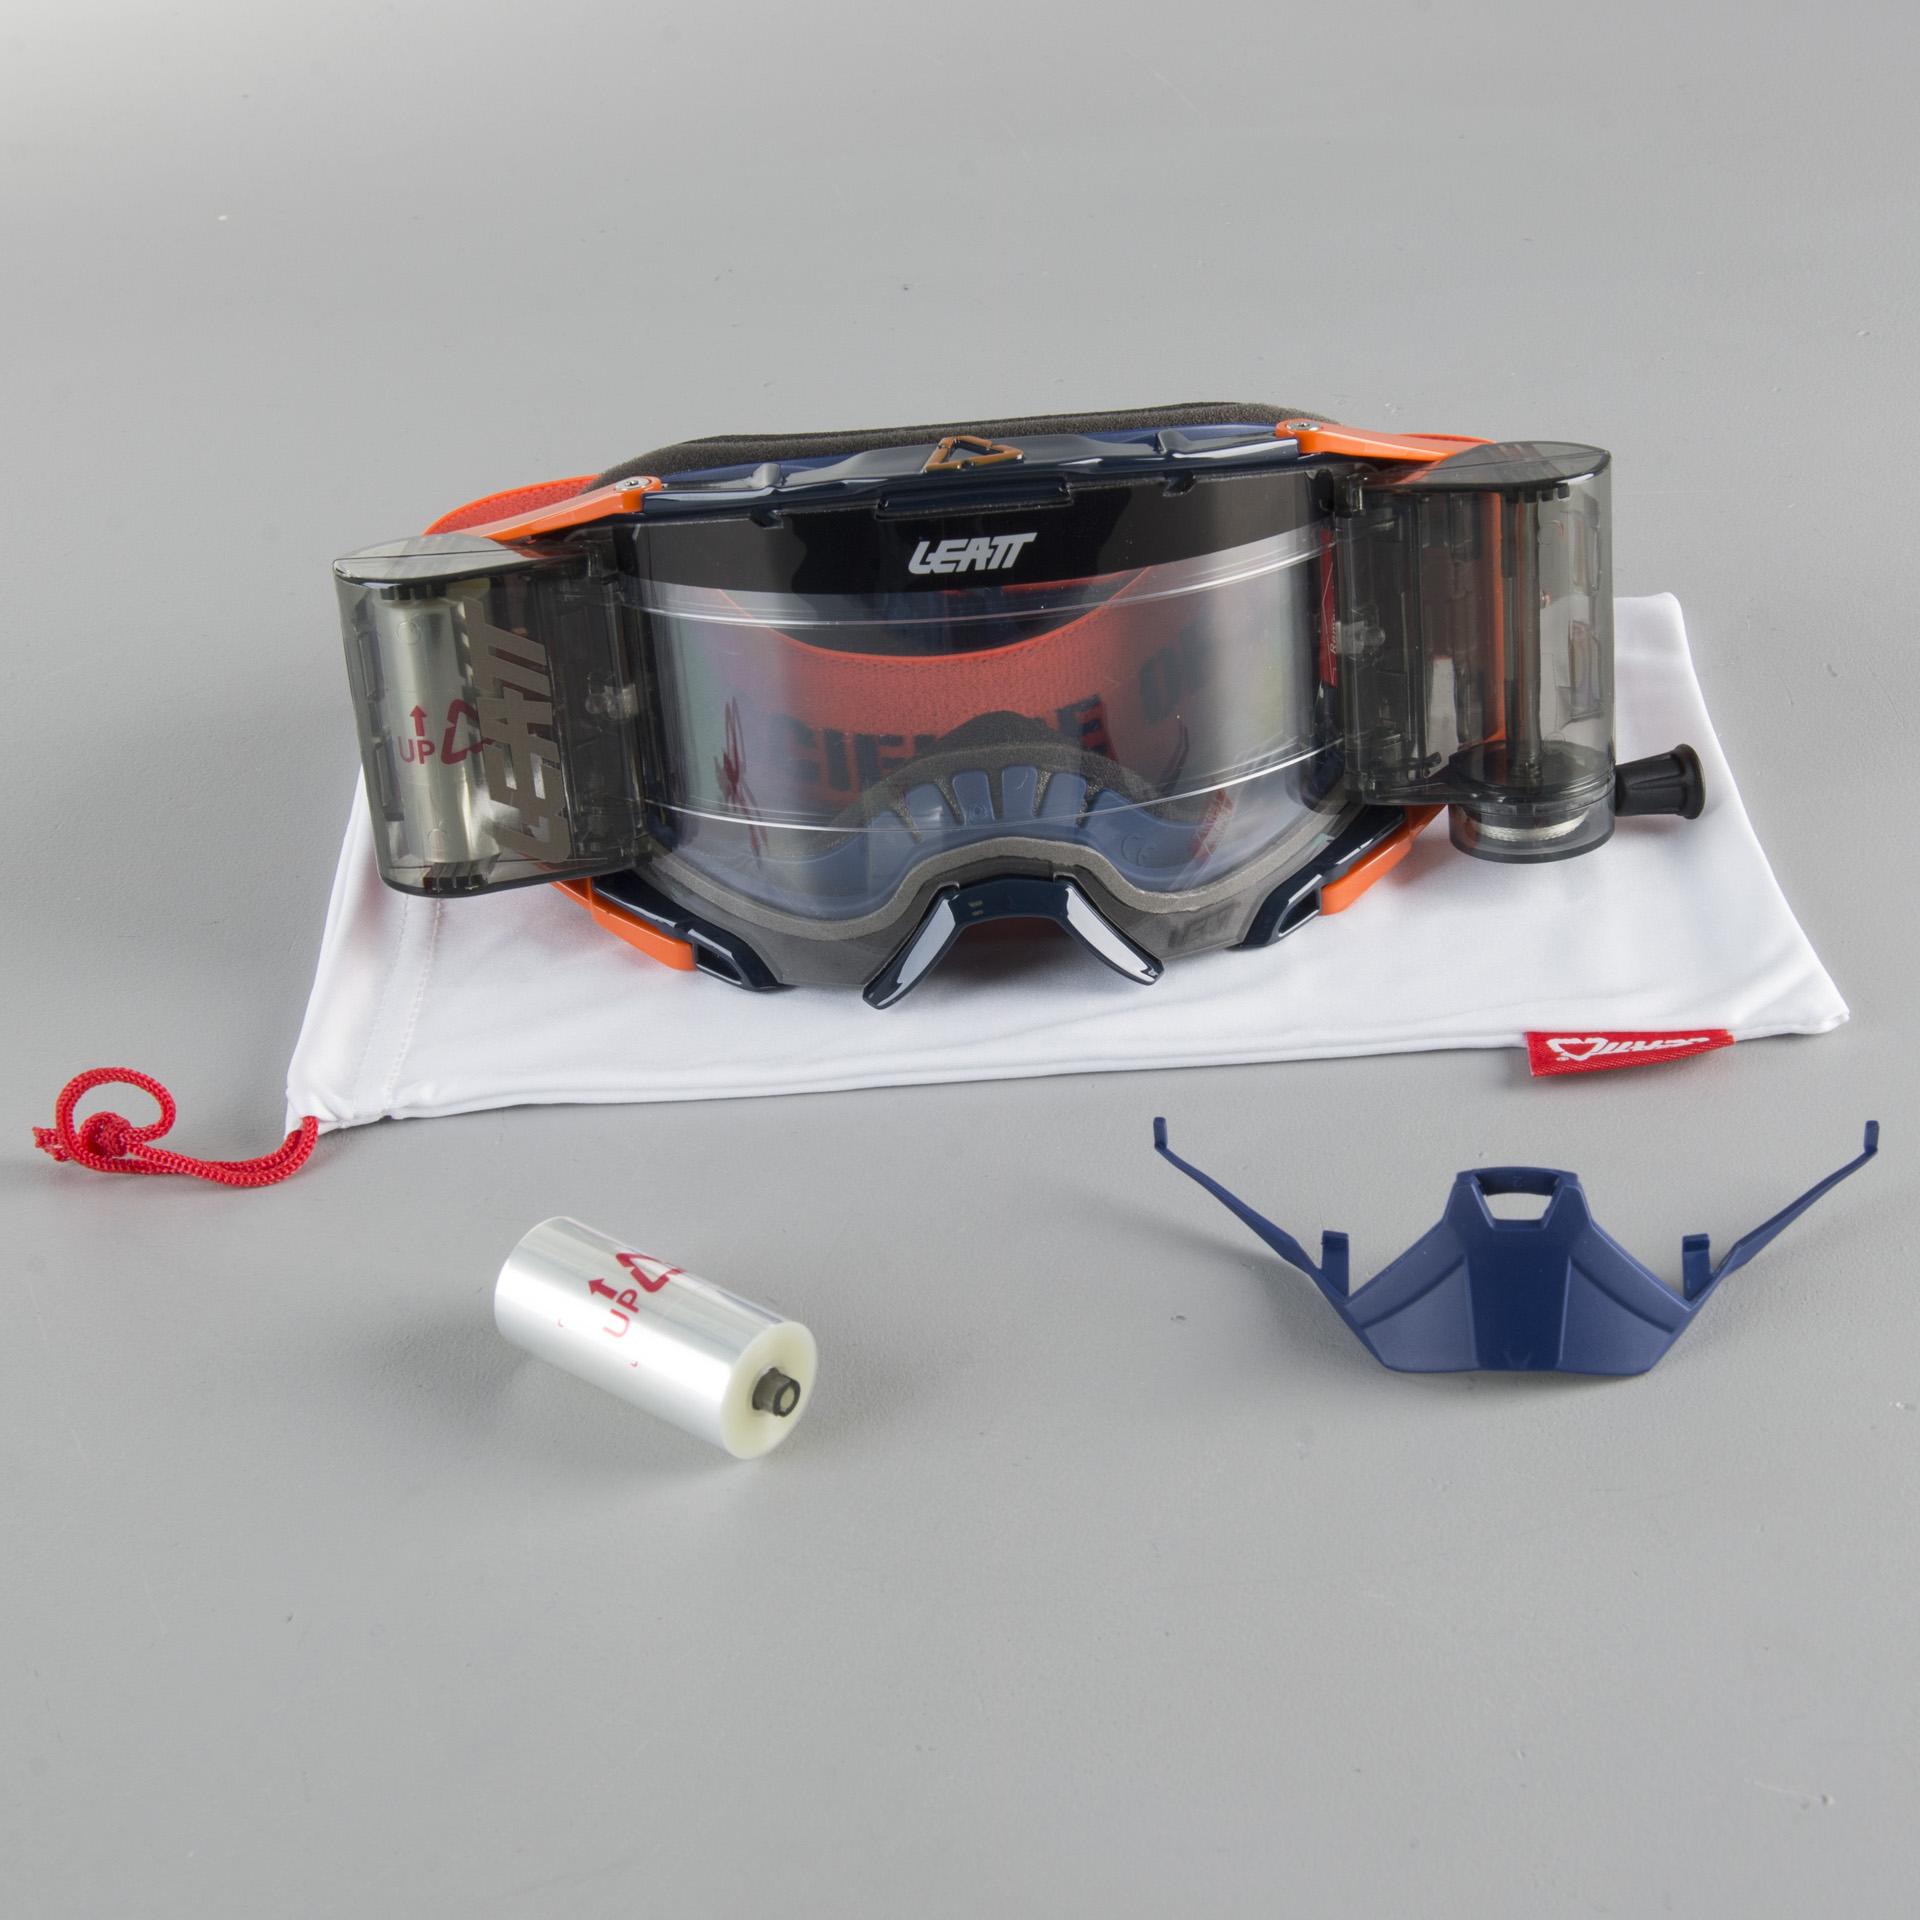 LEATT VELOCITY 6.5 ROLL-OFF MOTOCROSS MX GOGGLES WHITE CLEAR LENS RED